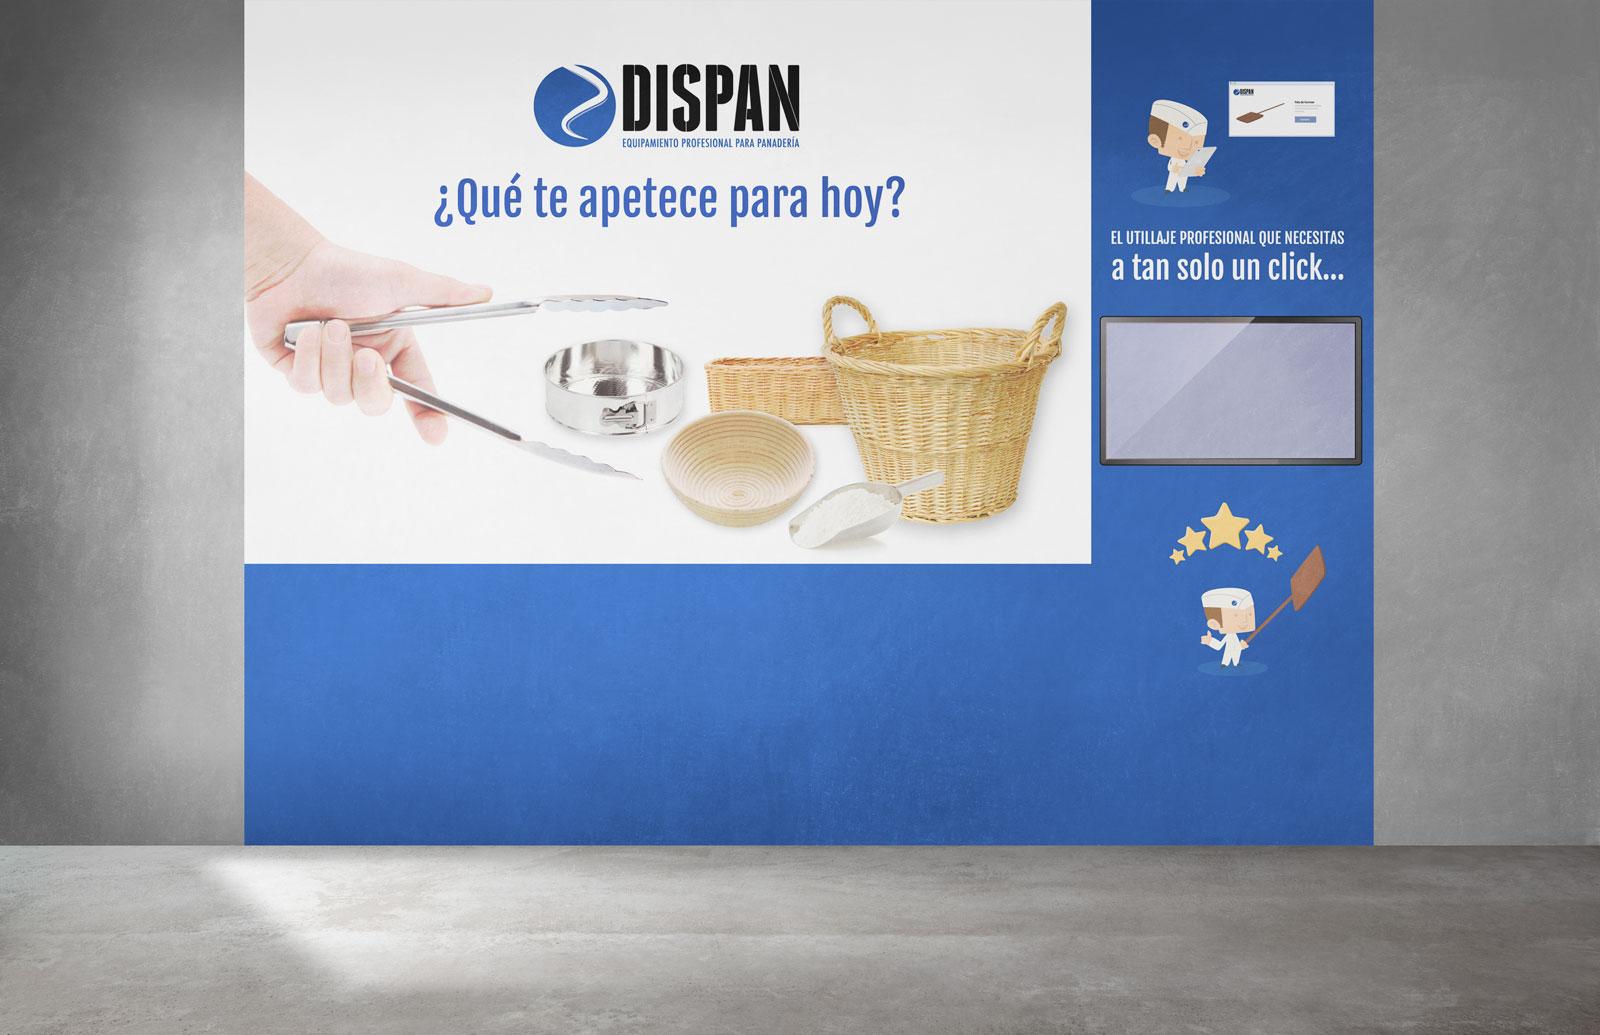 Dispan viniloStandA - Diseño stand ferial